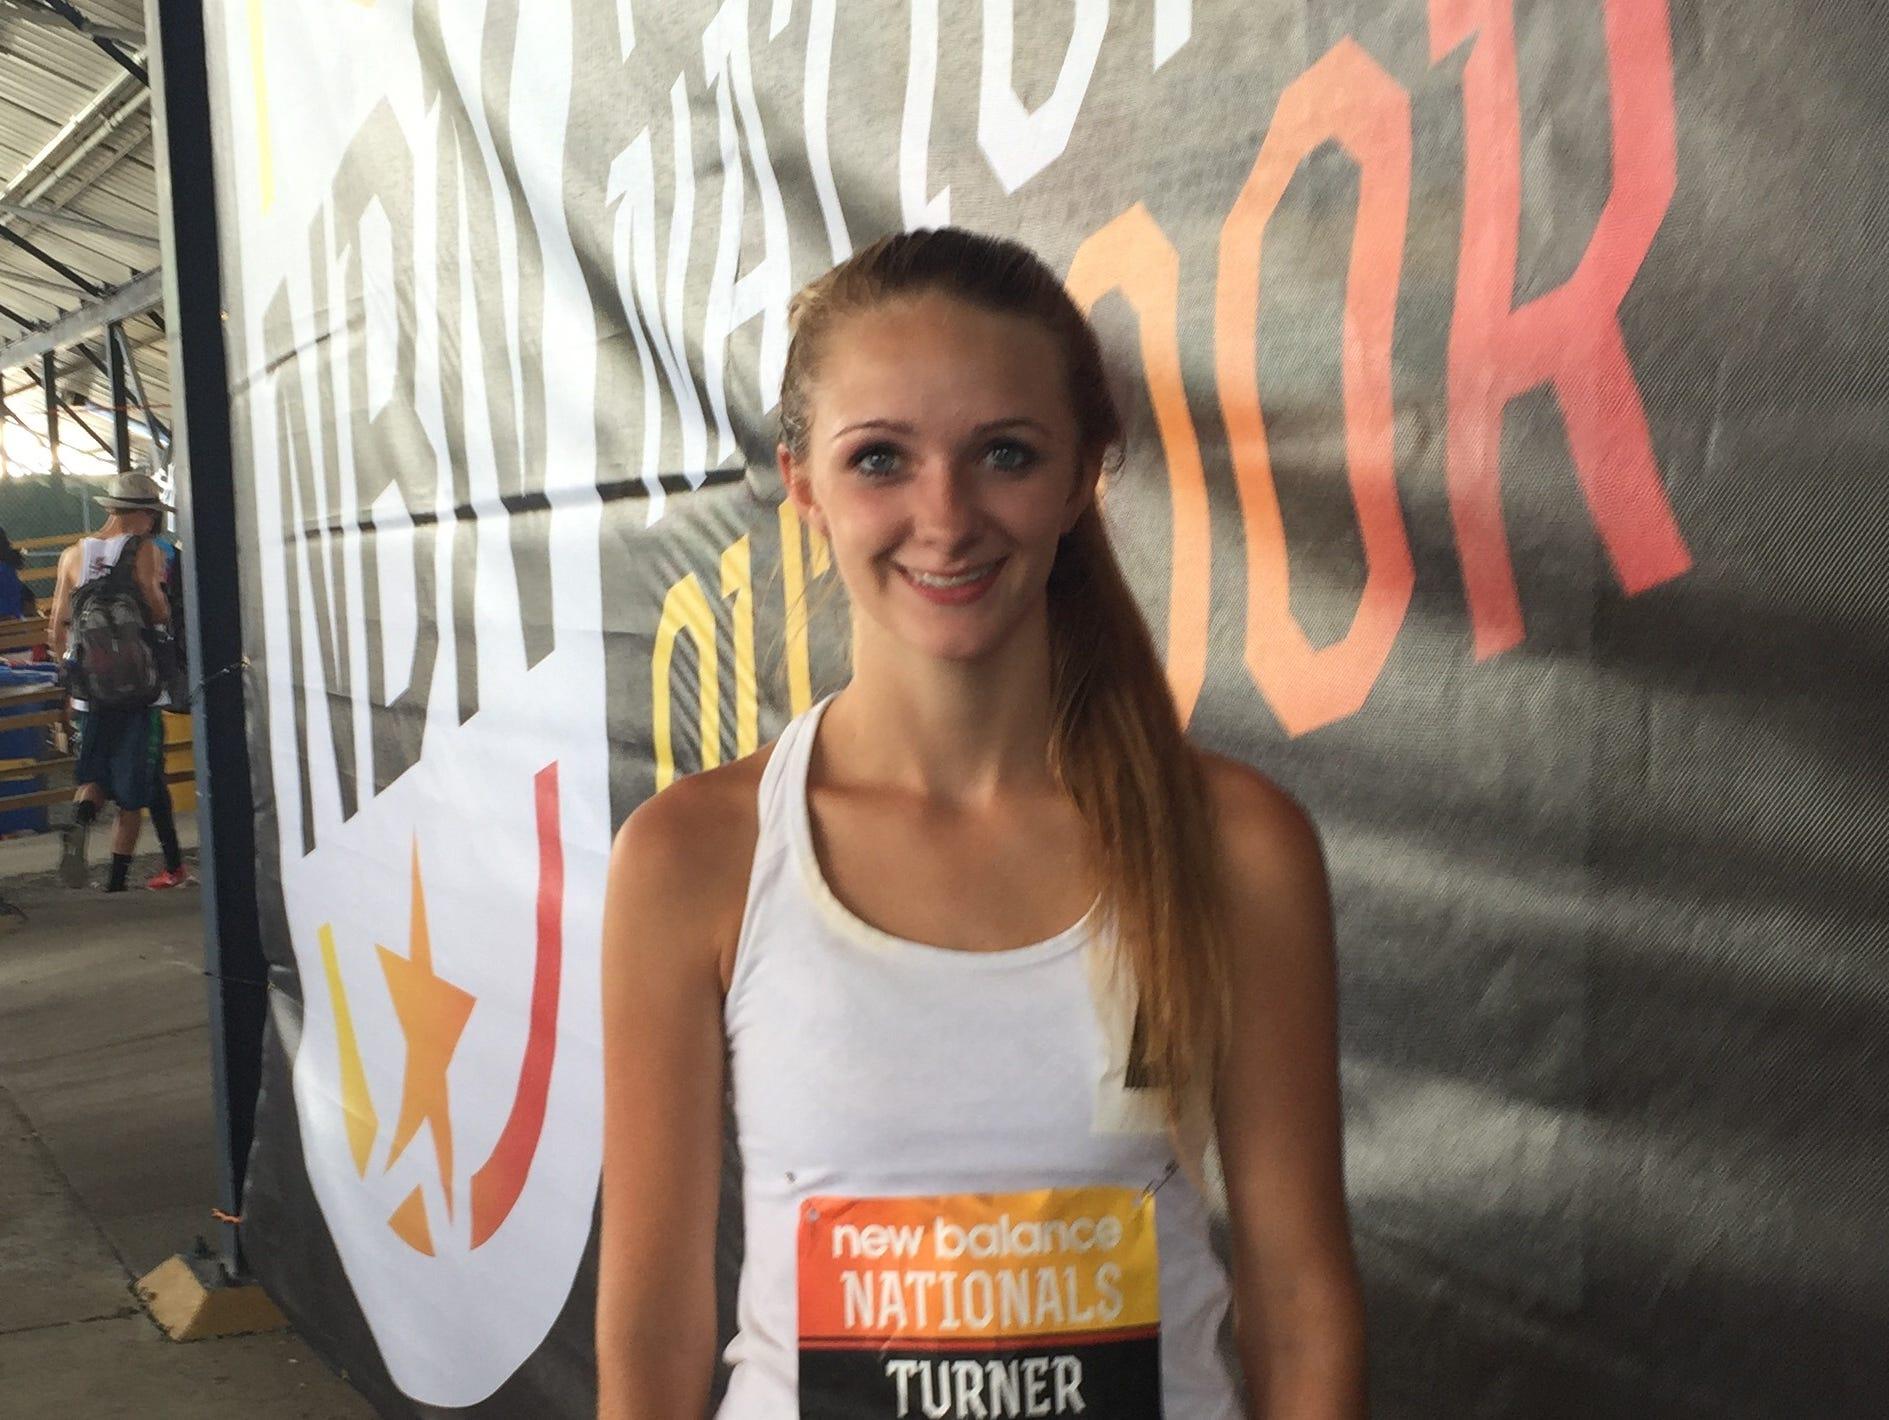 Tuscola's Brooke Turner